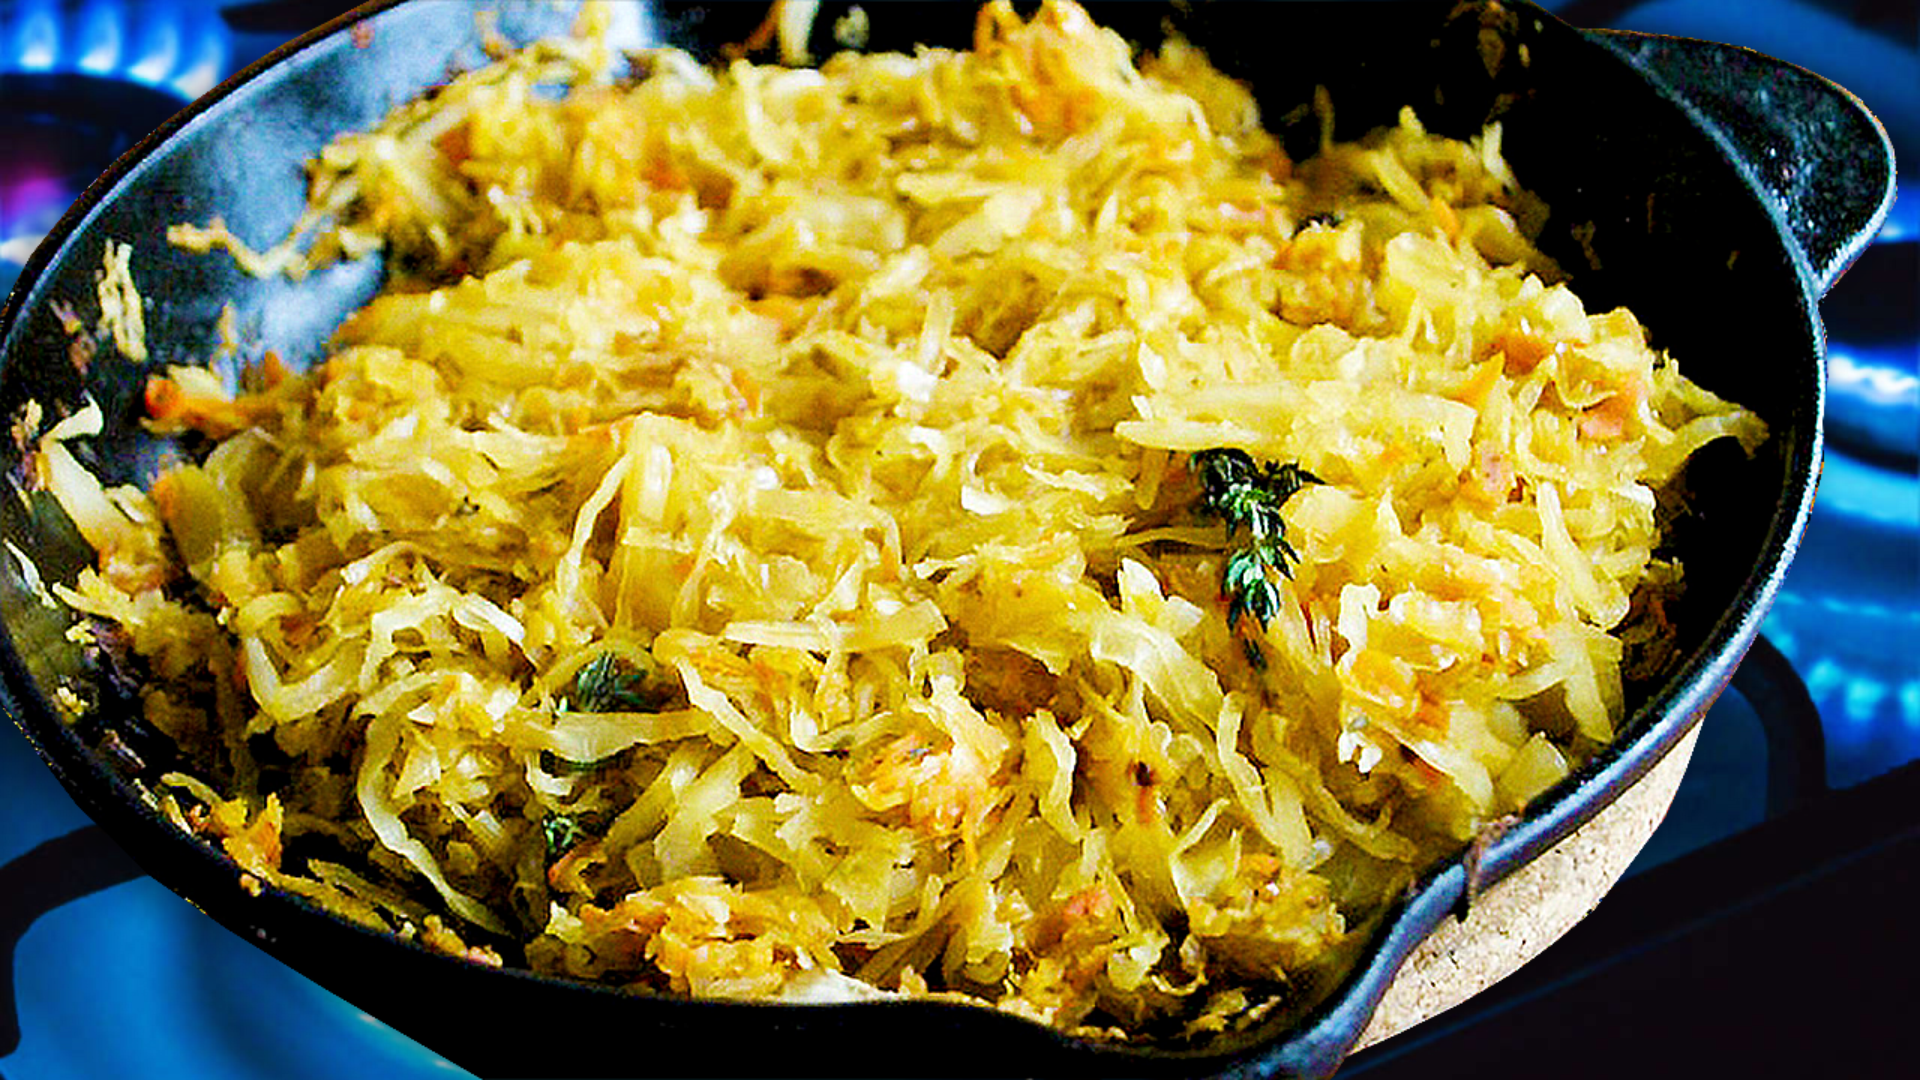 Fried Sauerkraut Recipe on the Stovetop